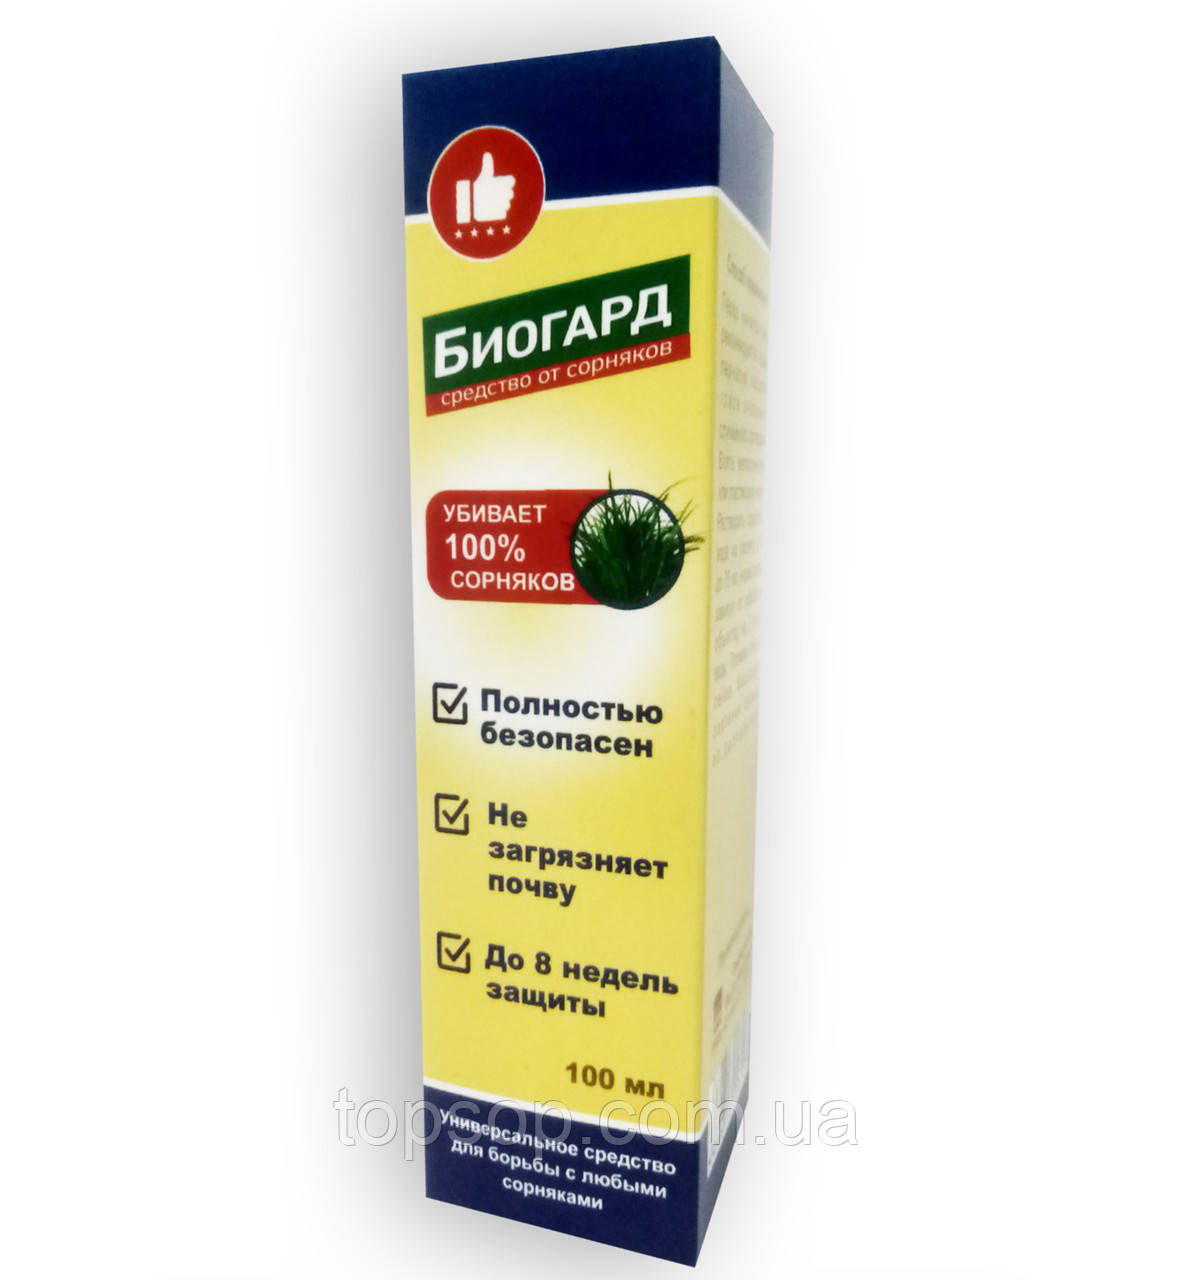 Гербицид биогард,гербицид биогард эффективное средство от сорняков